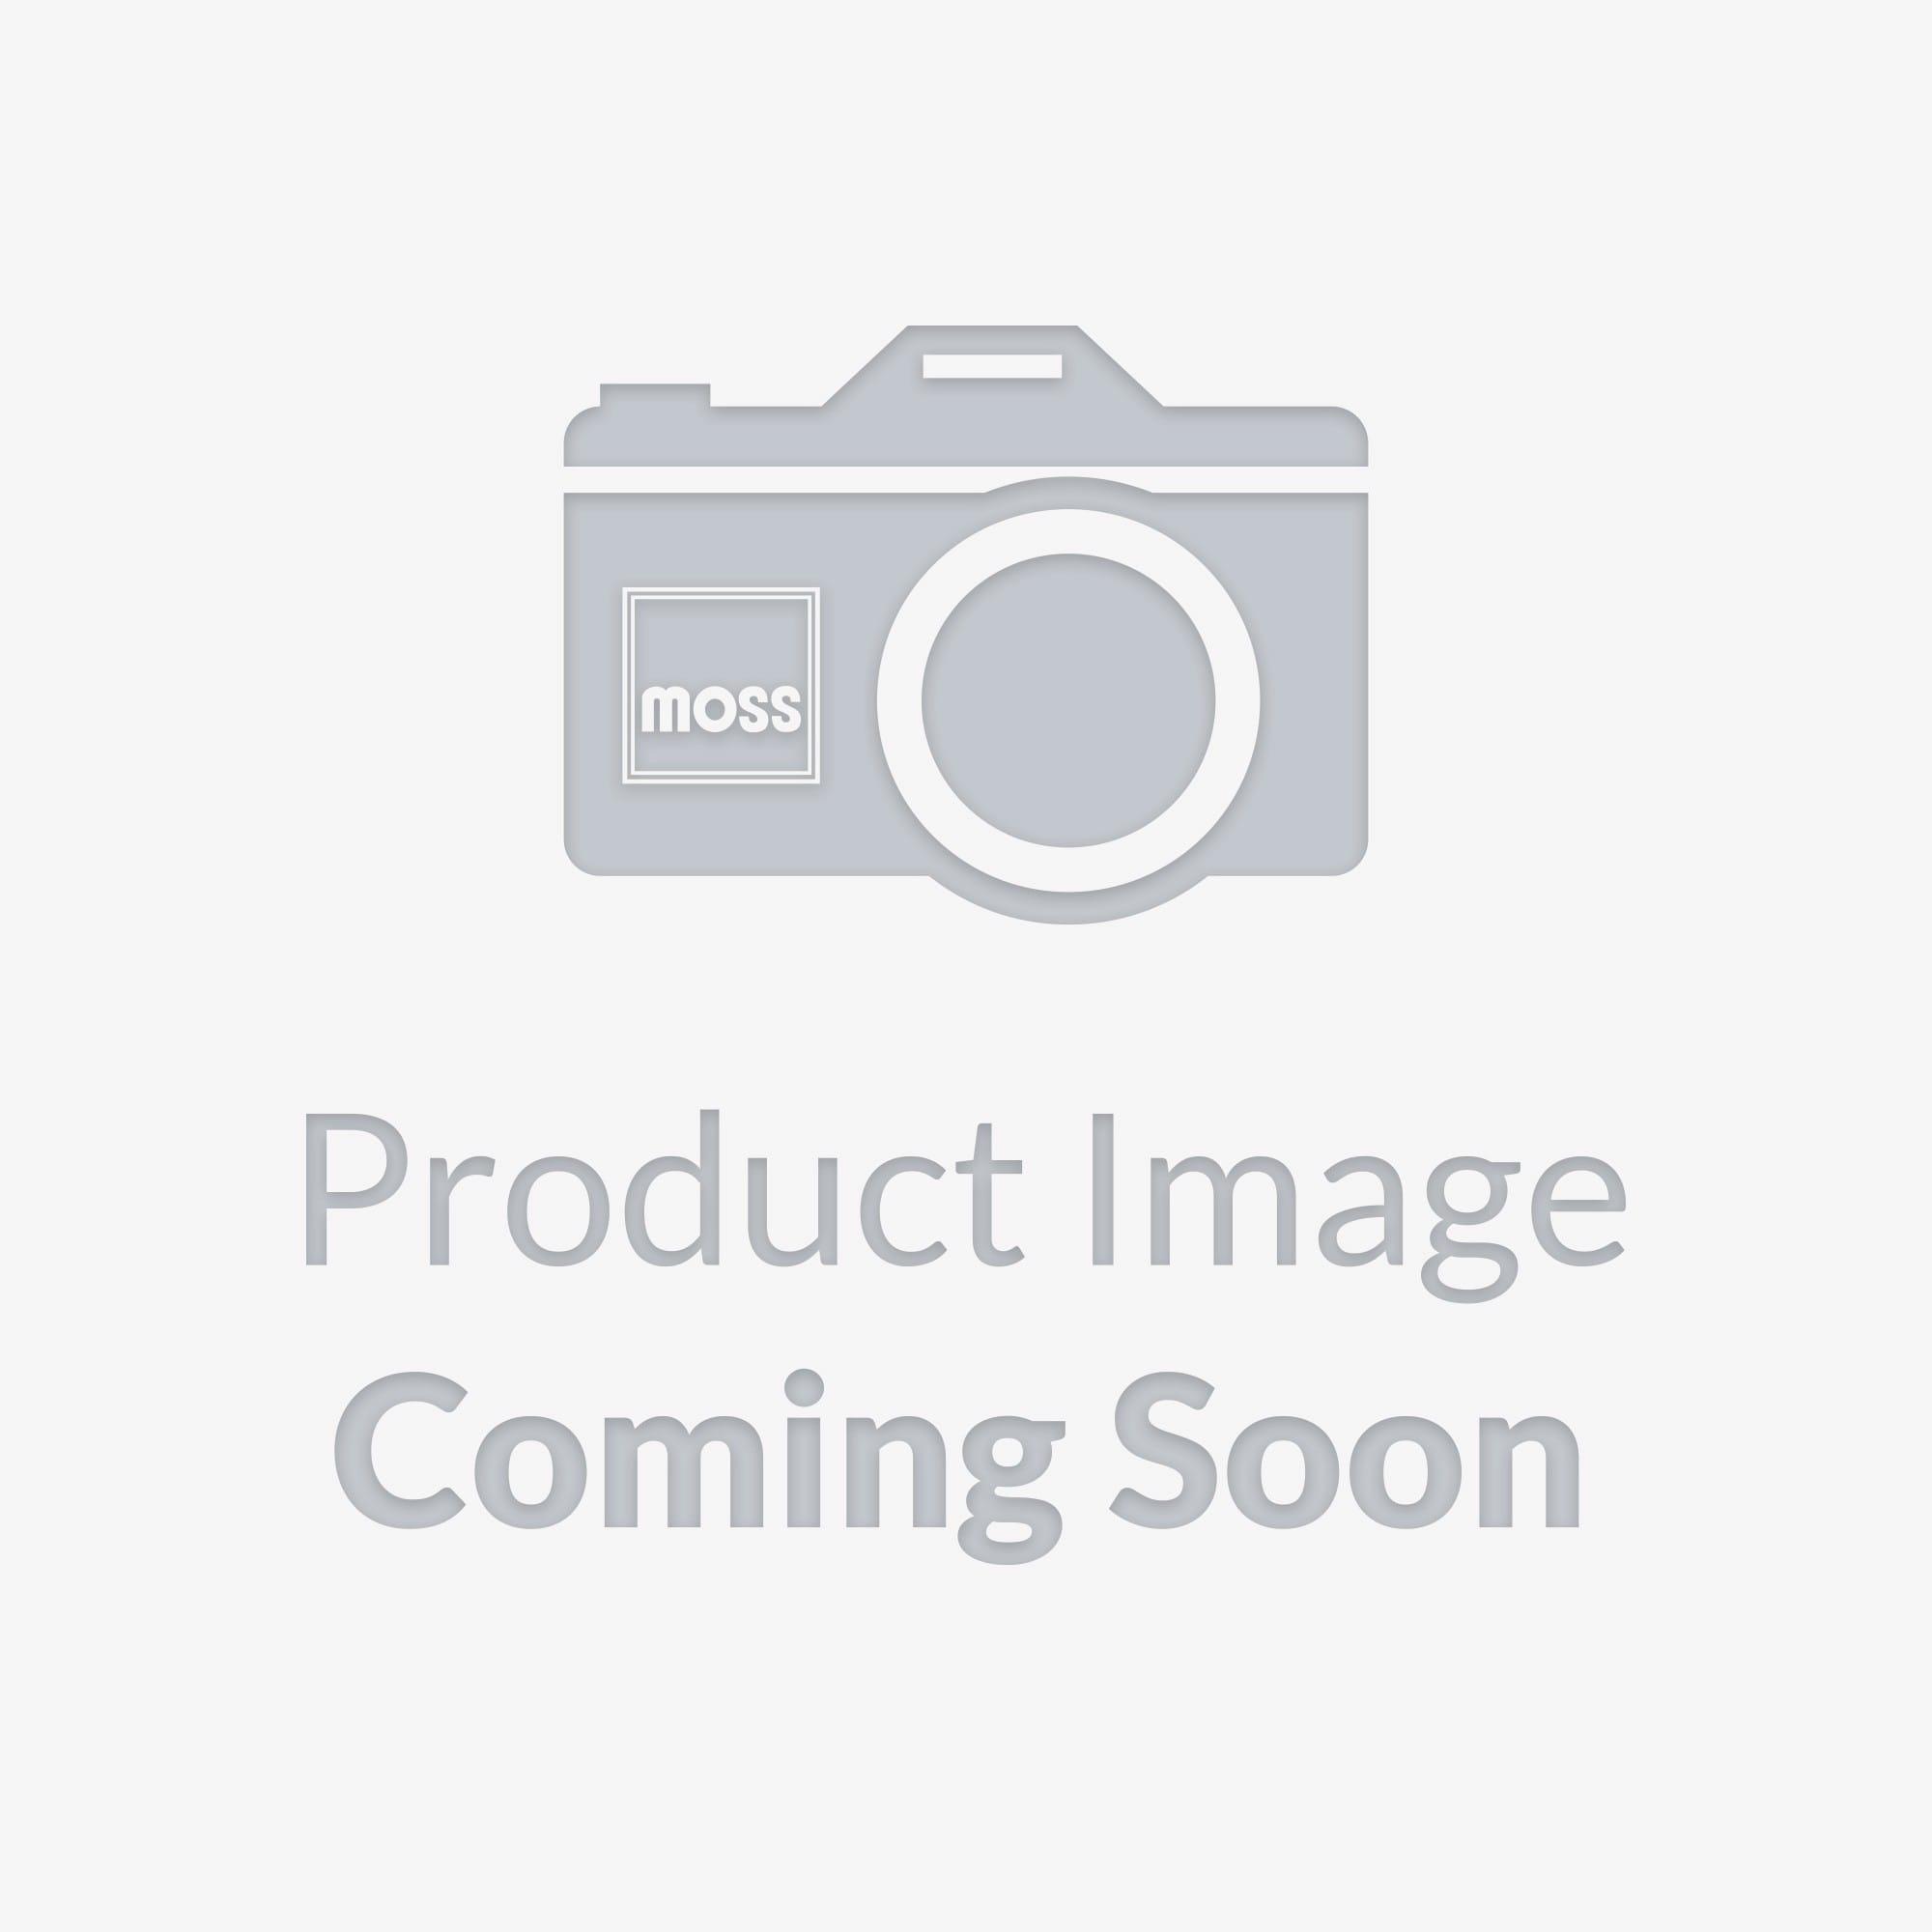 Trunk Liner Kits Carpet Kits Amp Floor Mats Upholstery